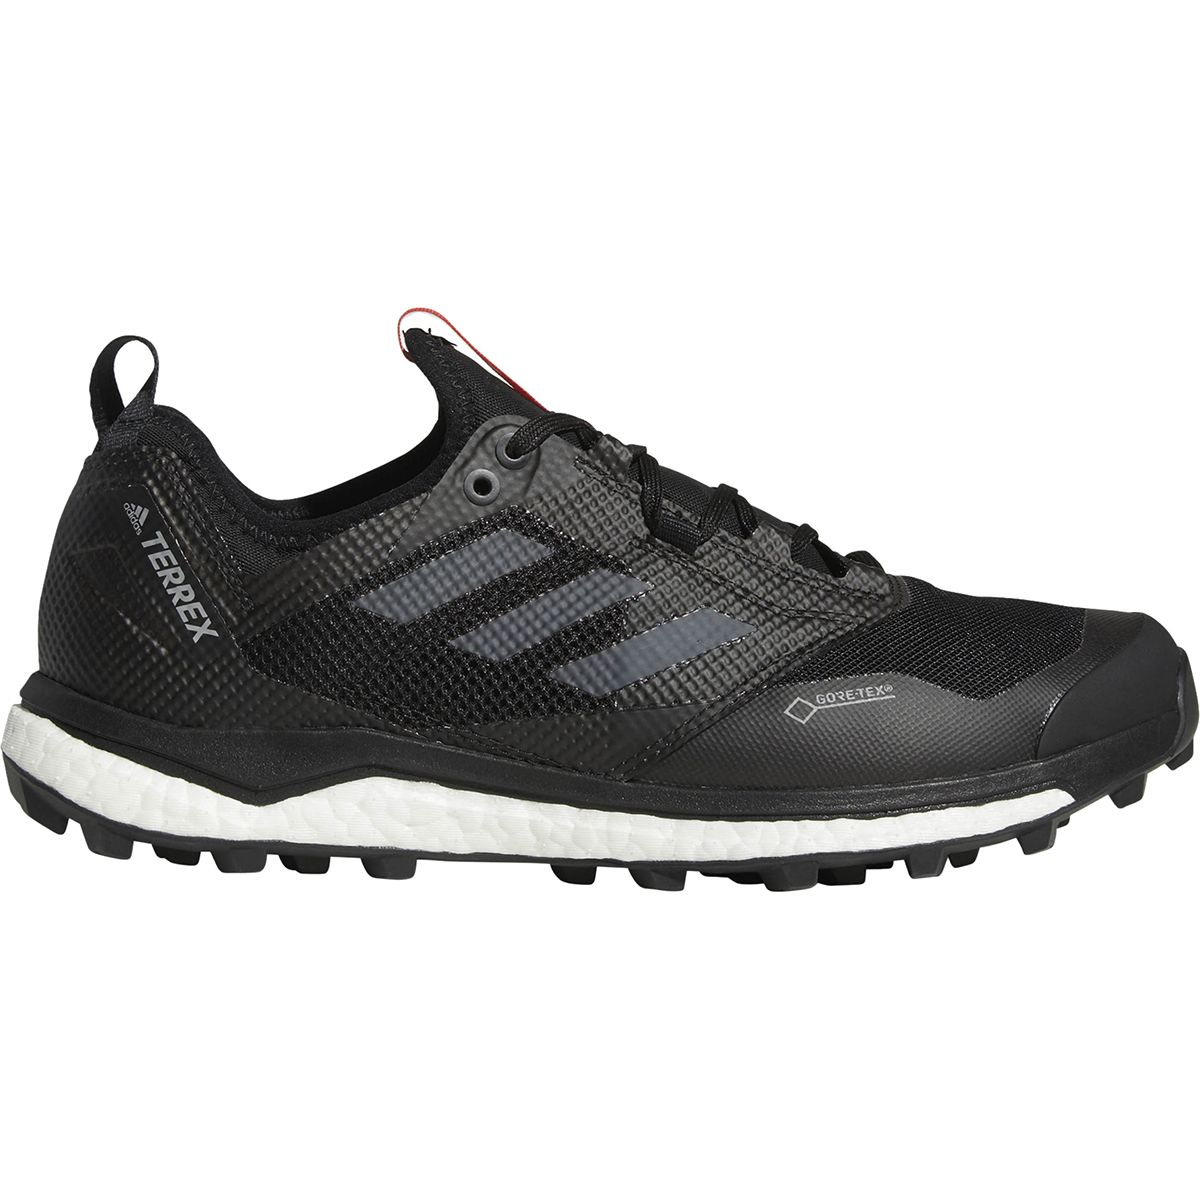 Adidas Outdoor Terrex Agravic Boost Xt Gtx Shoe Mens